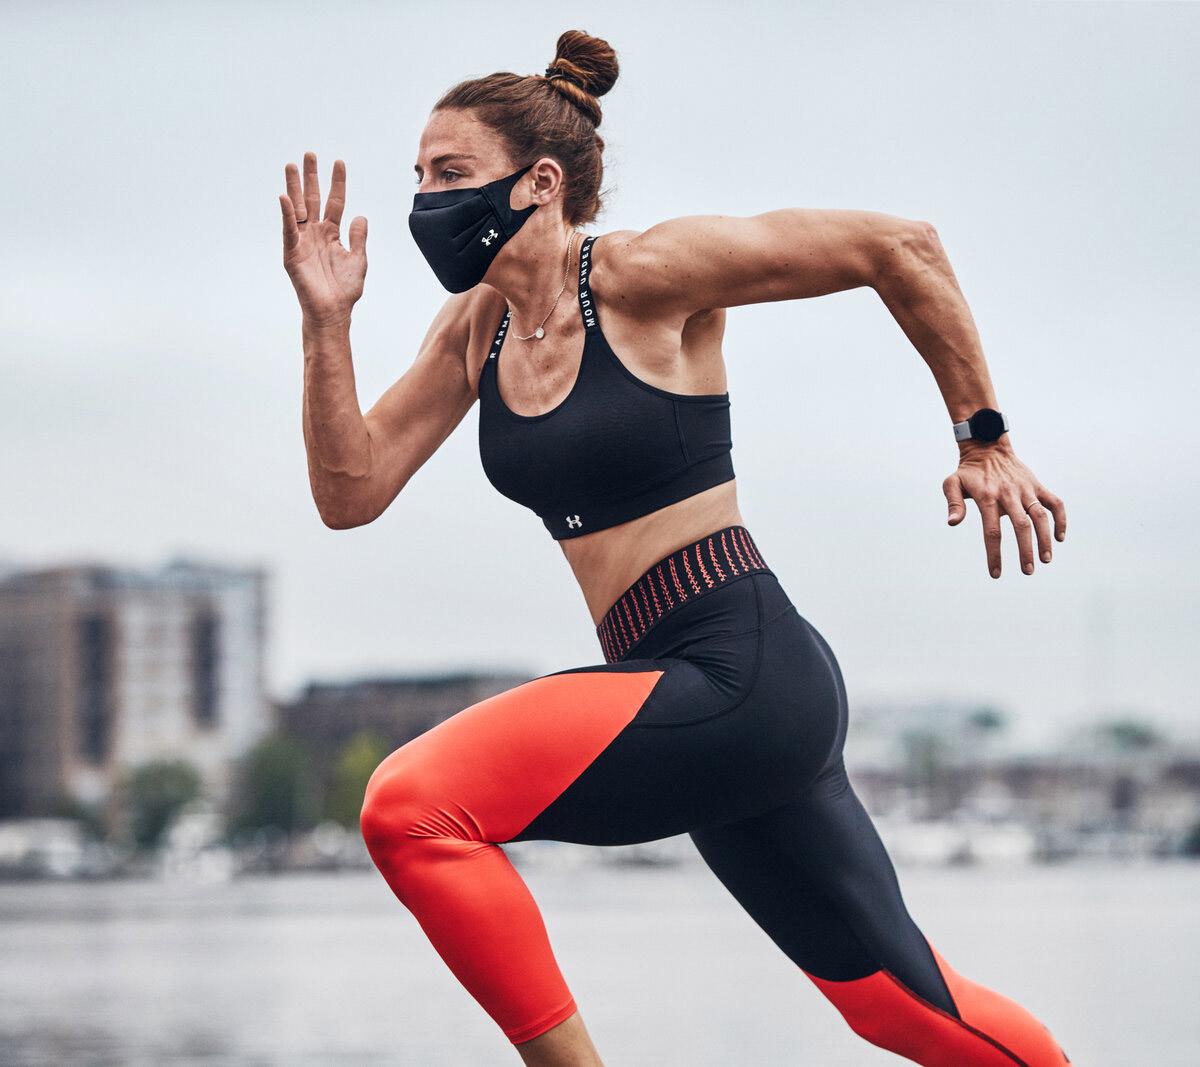 ua-sports-mask-des-3-new.jpg